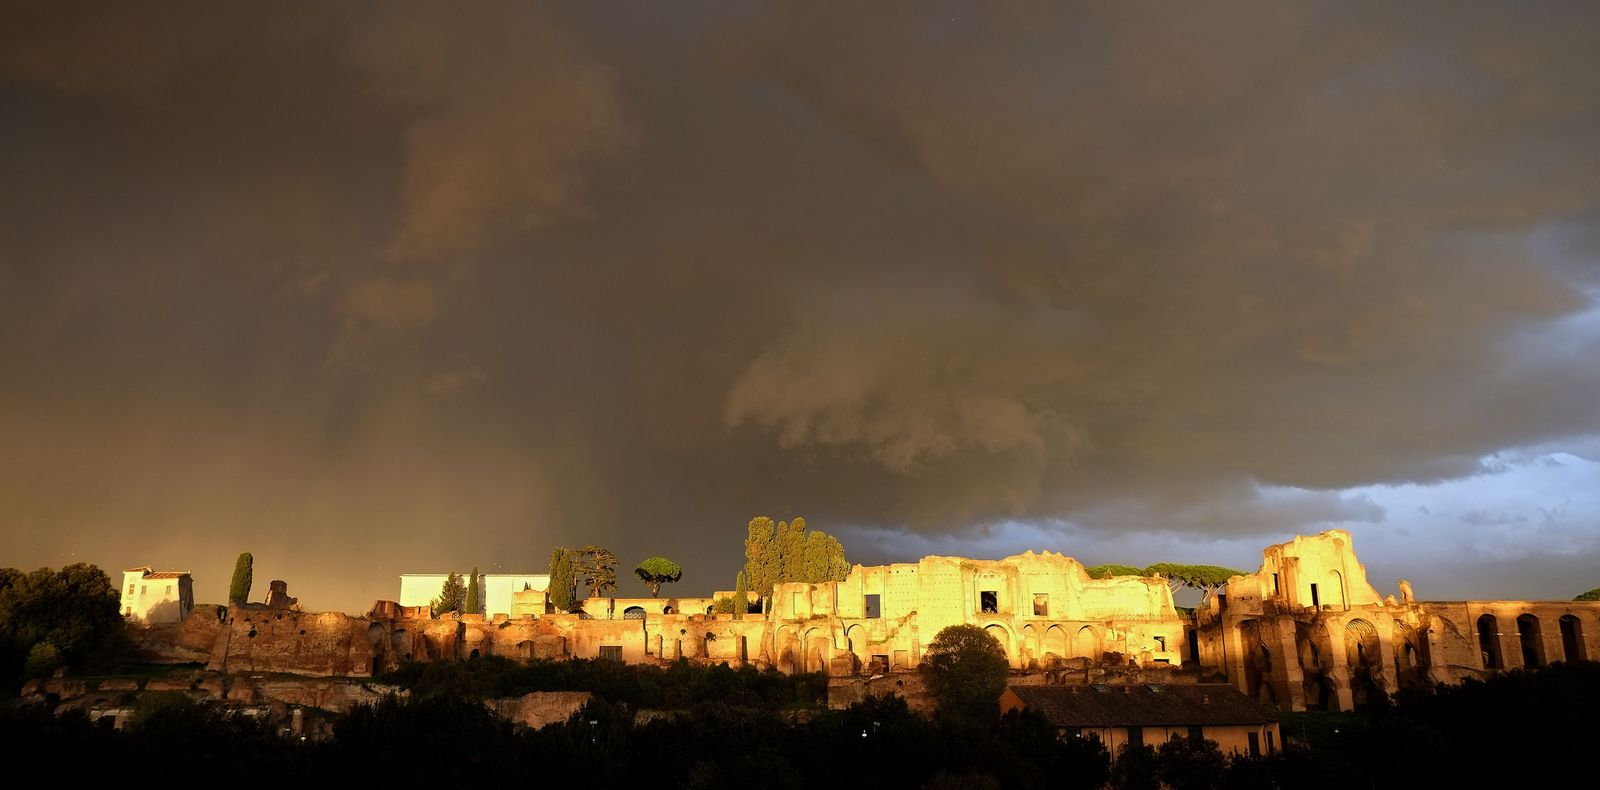 ITALY-ROME-CIRCUS MAXIMUS-SUN